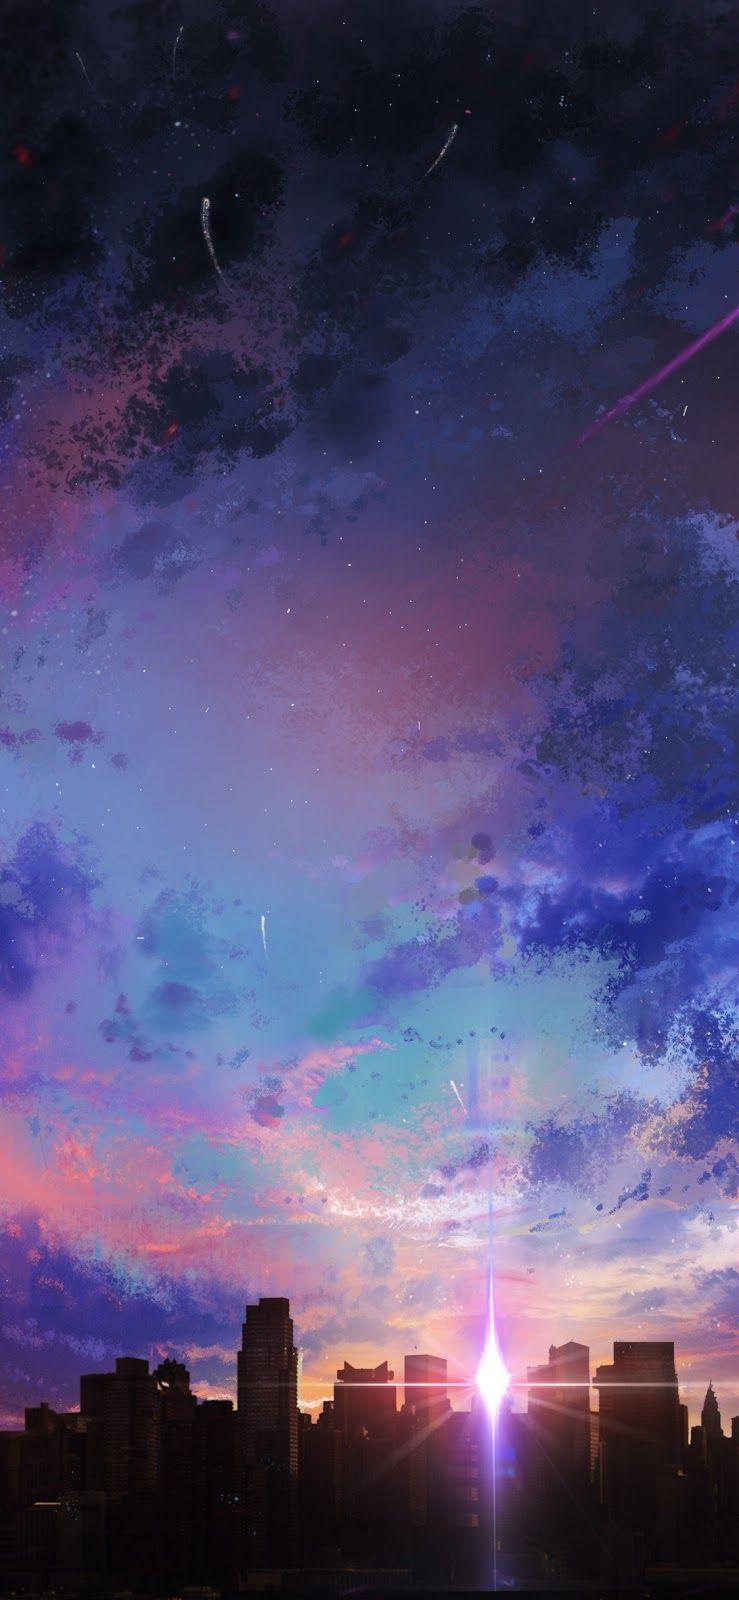 Anime Sunset Variant Iphone X 風景 幻想的 絵